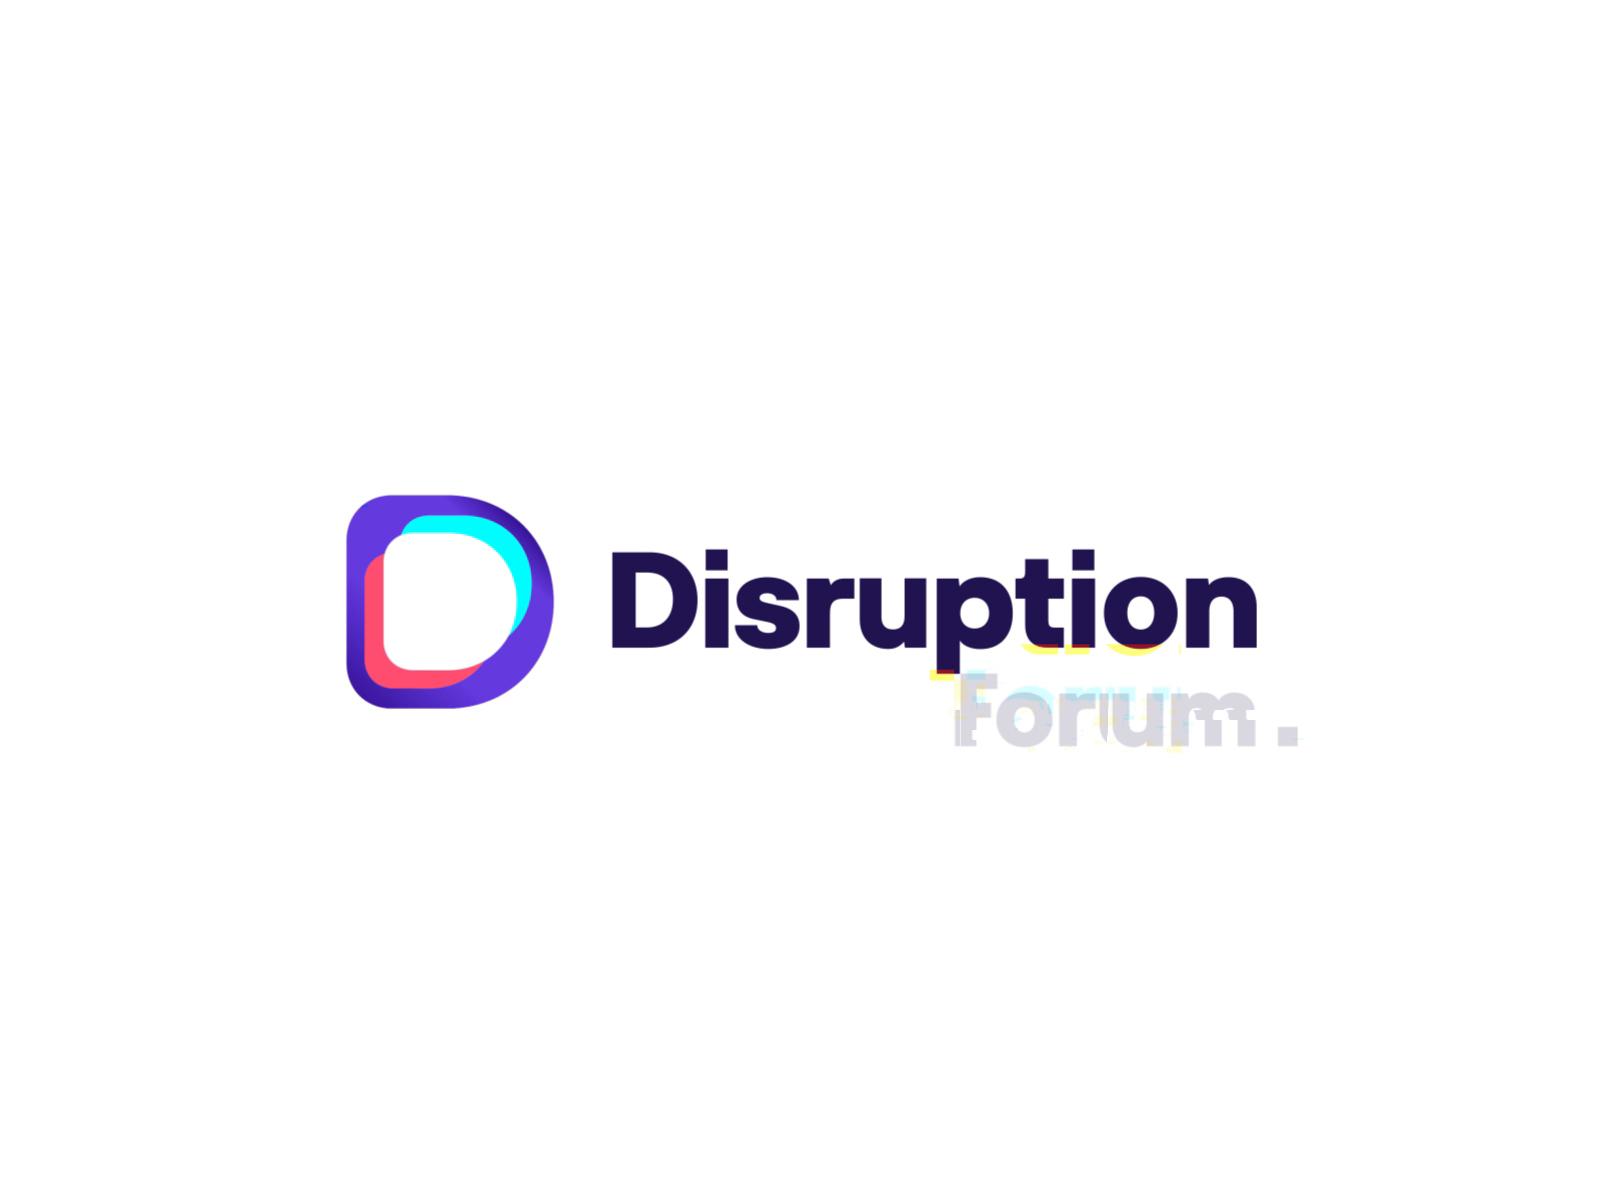 Disruption Forum Logo Animation